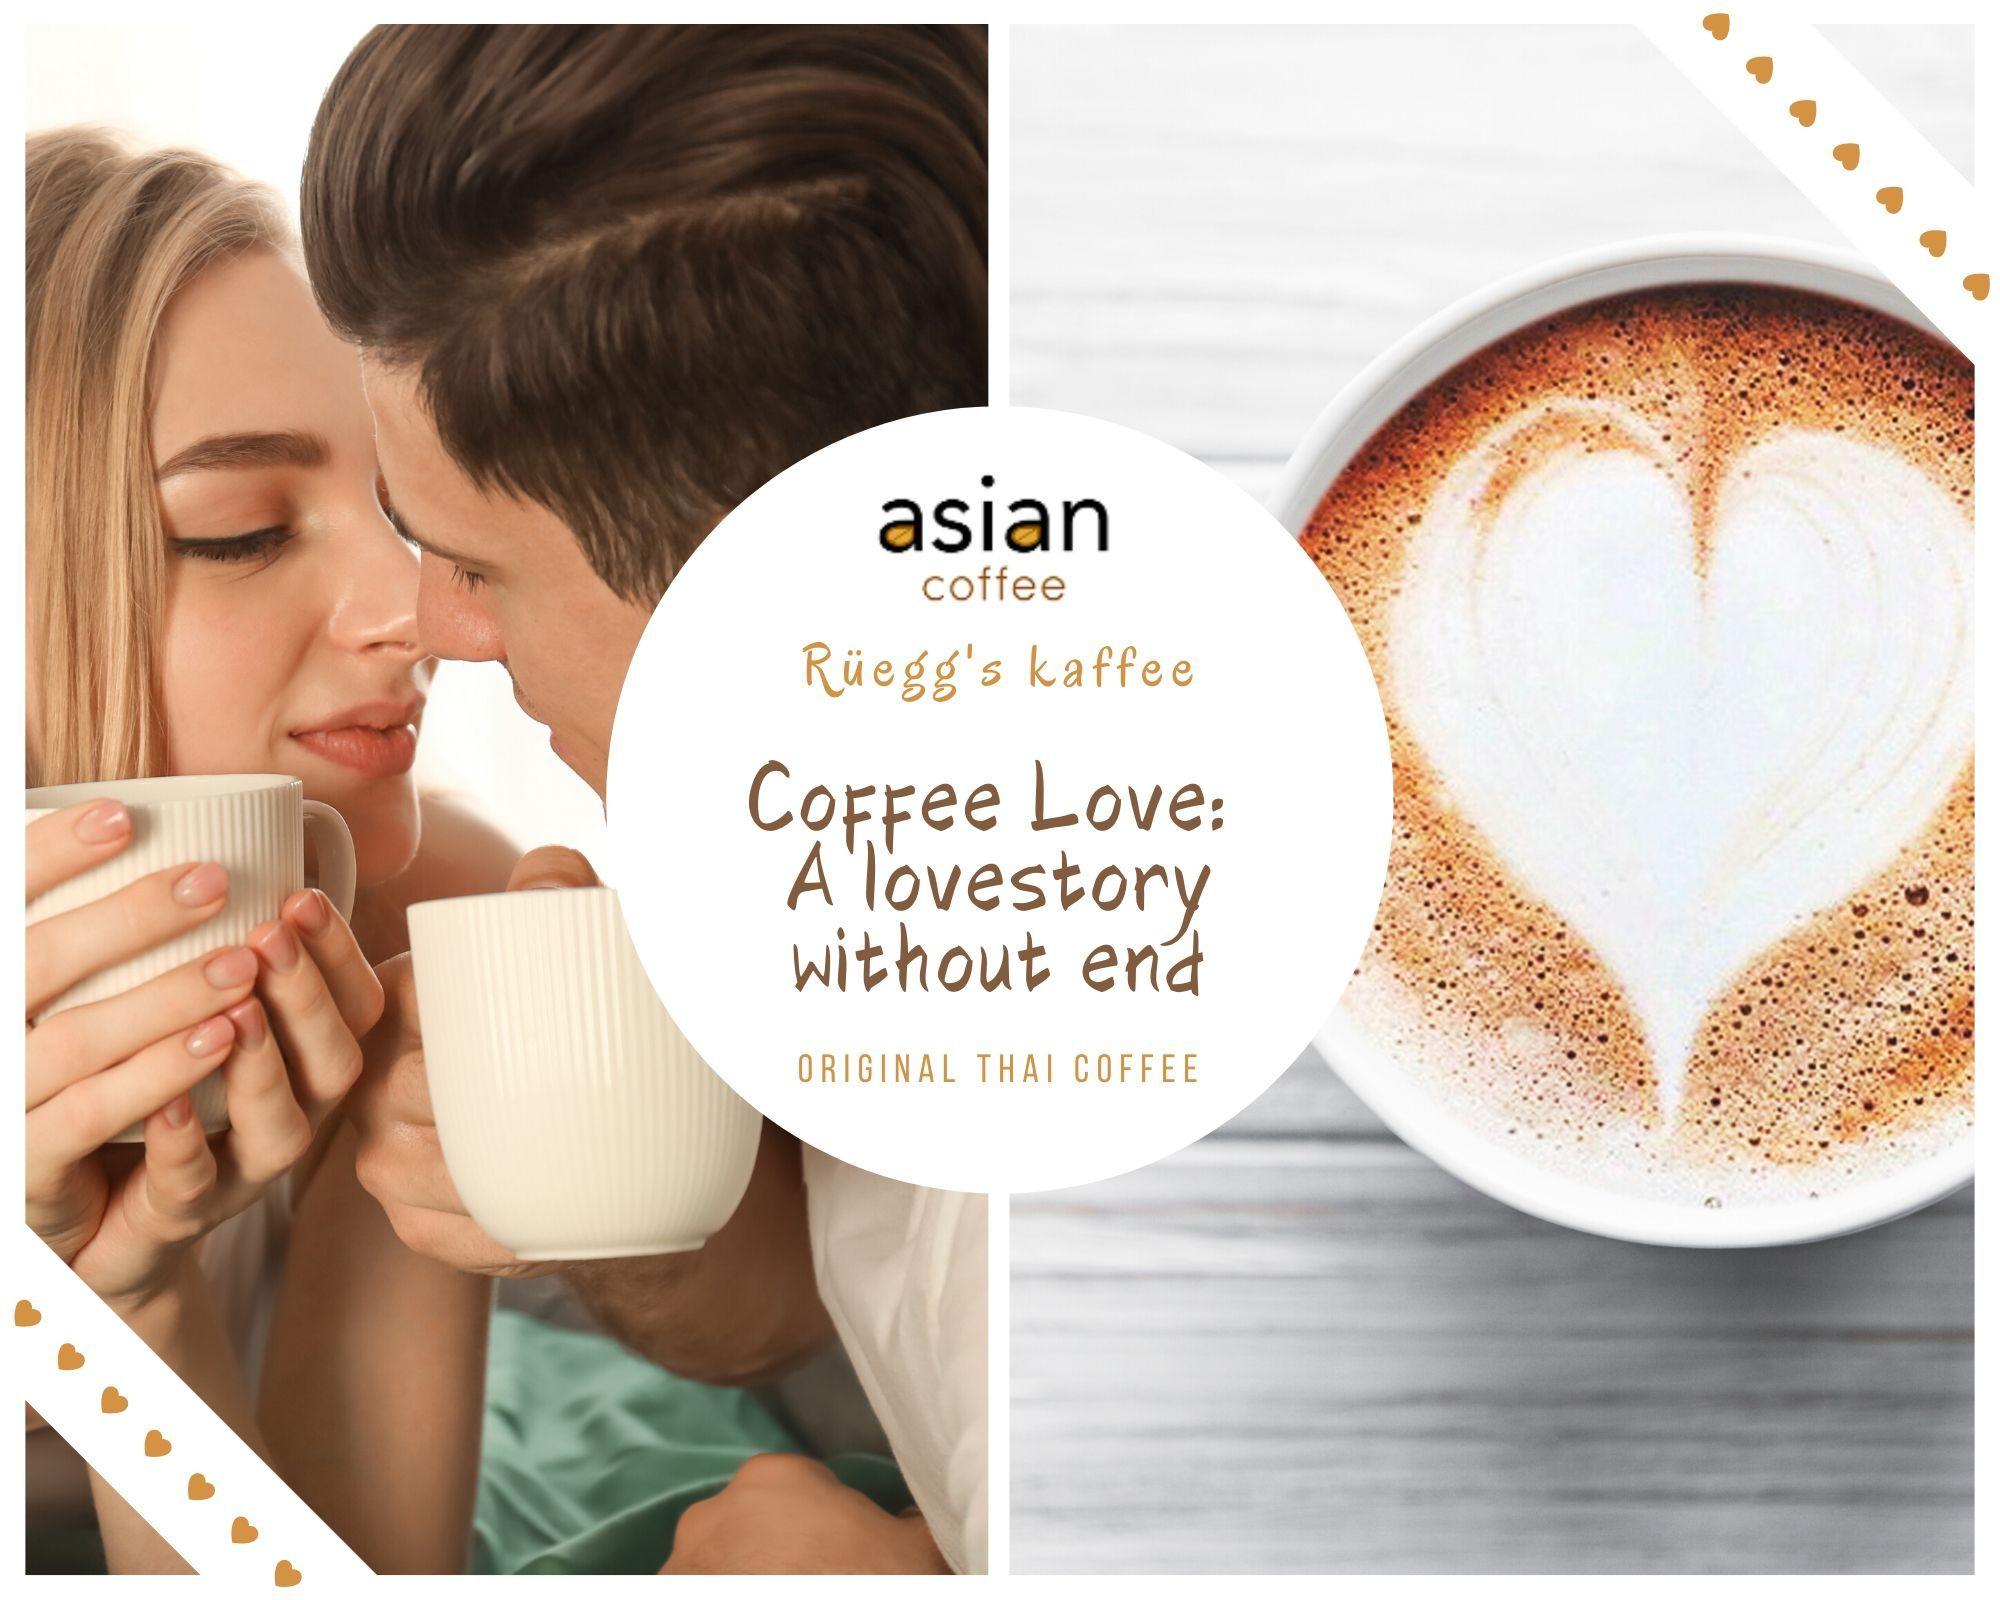 Kaffee-Liebe, eine Liebe, die ewig hält! www.rueggs.com  #coffeetime #cafe #coffeelover #coffeeaddict #coffeeshop #espresso #love #specialtycoffee #coffeelove #caffeine #coffeelife #coffeeholic